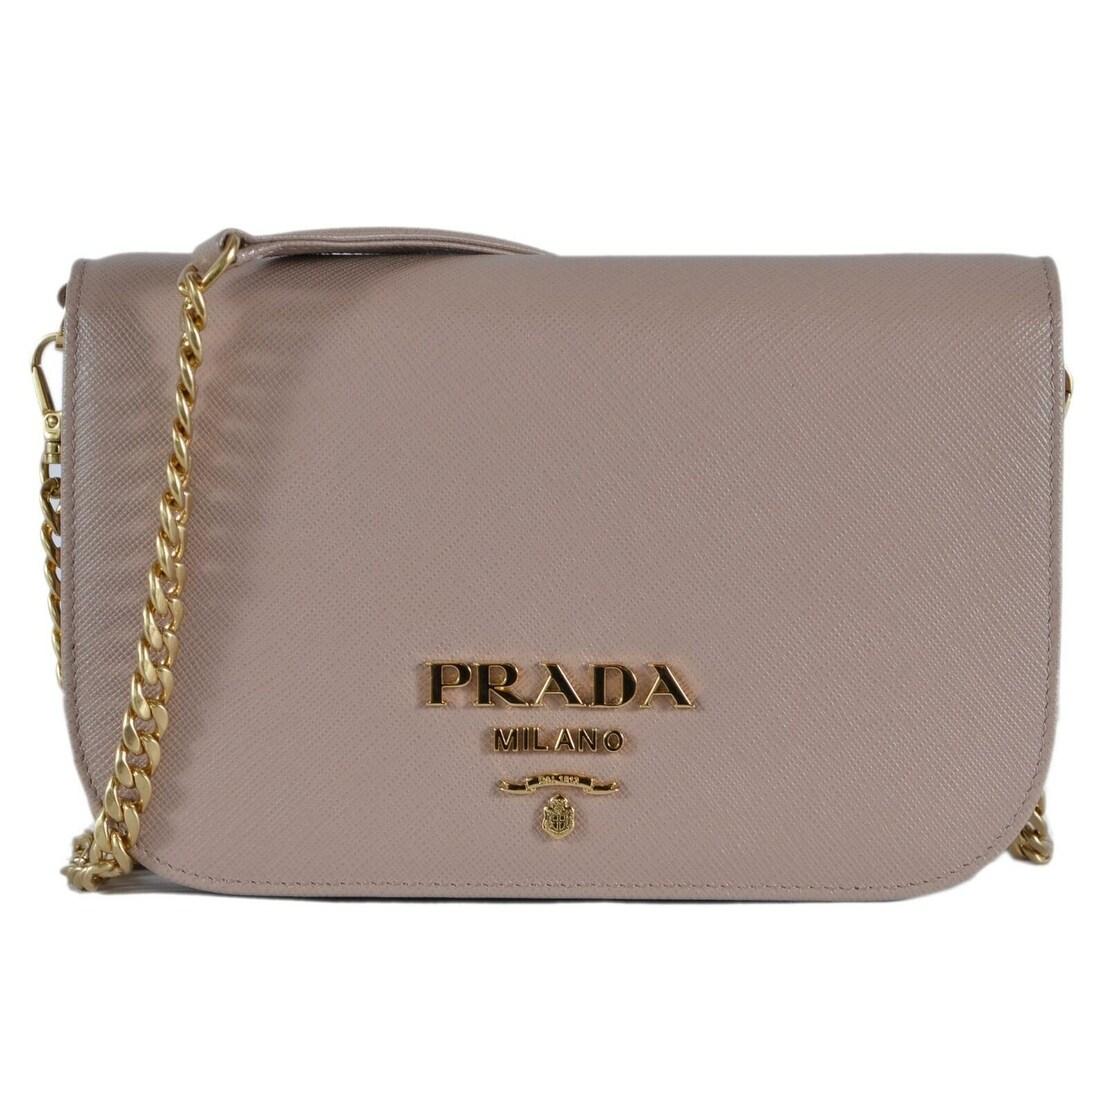 Shop Prada 1BP013 Cipria Borsa Portafoglio Saffiano Lux Small Crossbody Purse  Bag - Beige - Free Shipping Today - Overstock - 27423067 80352a0f442de